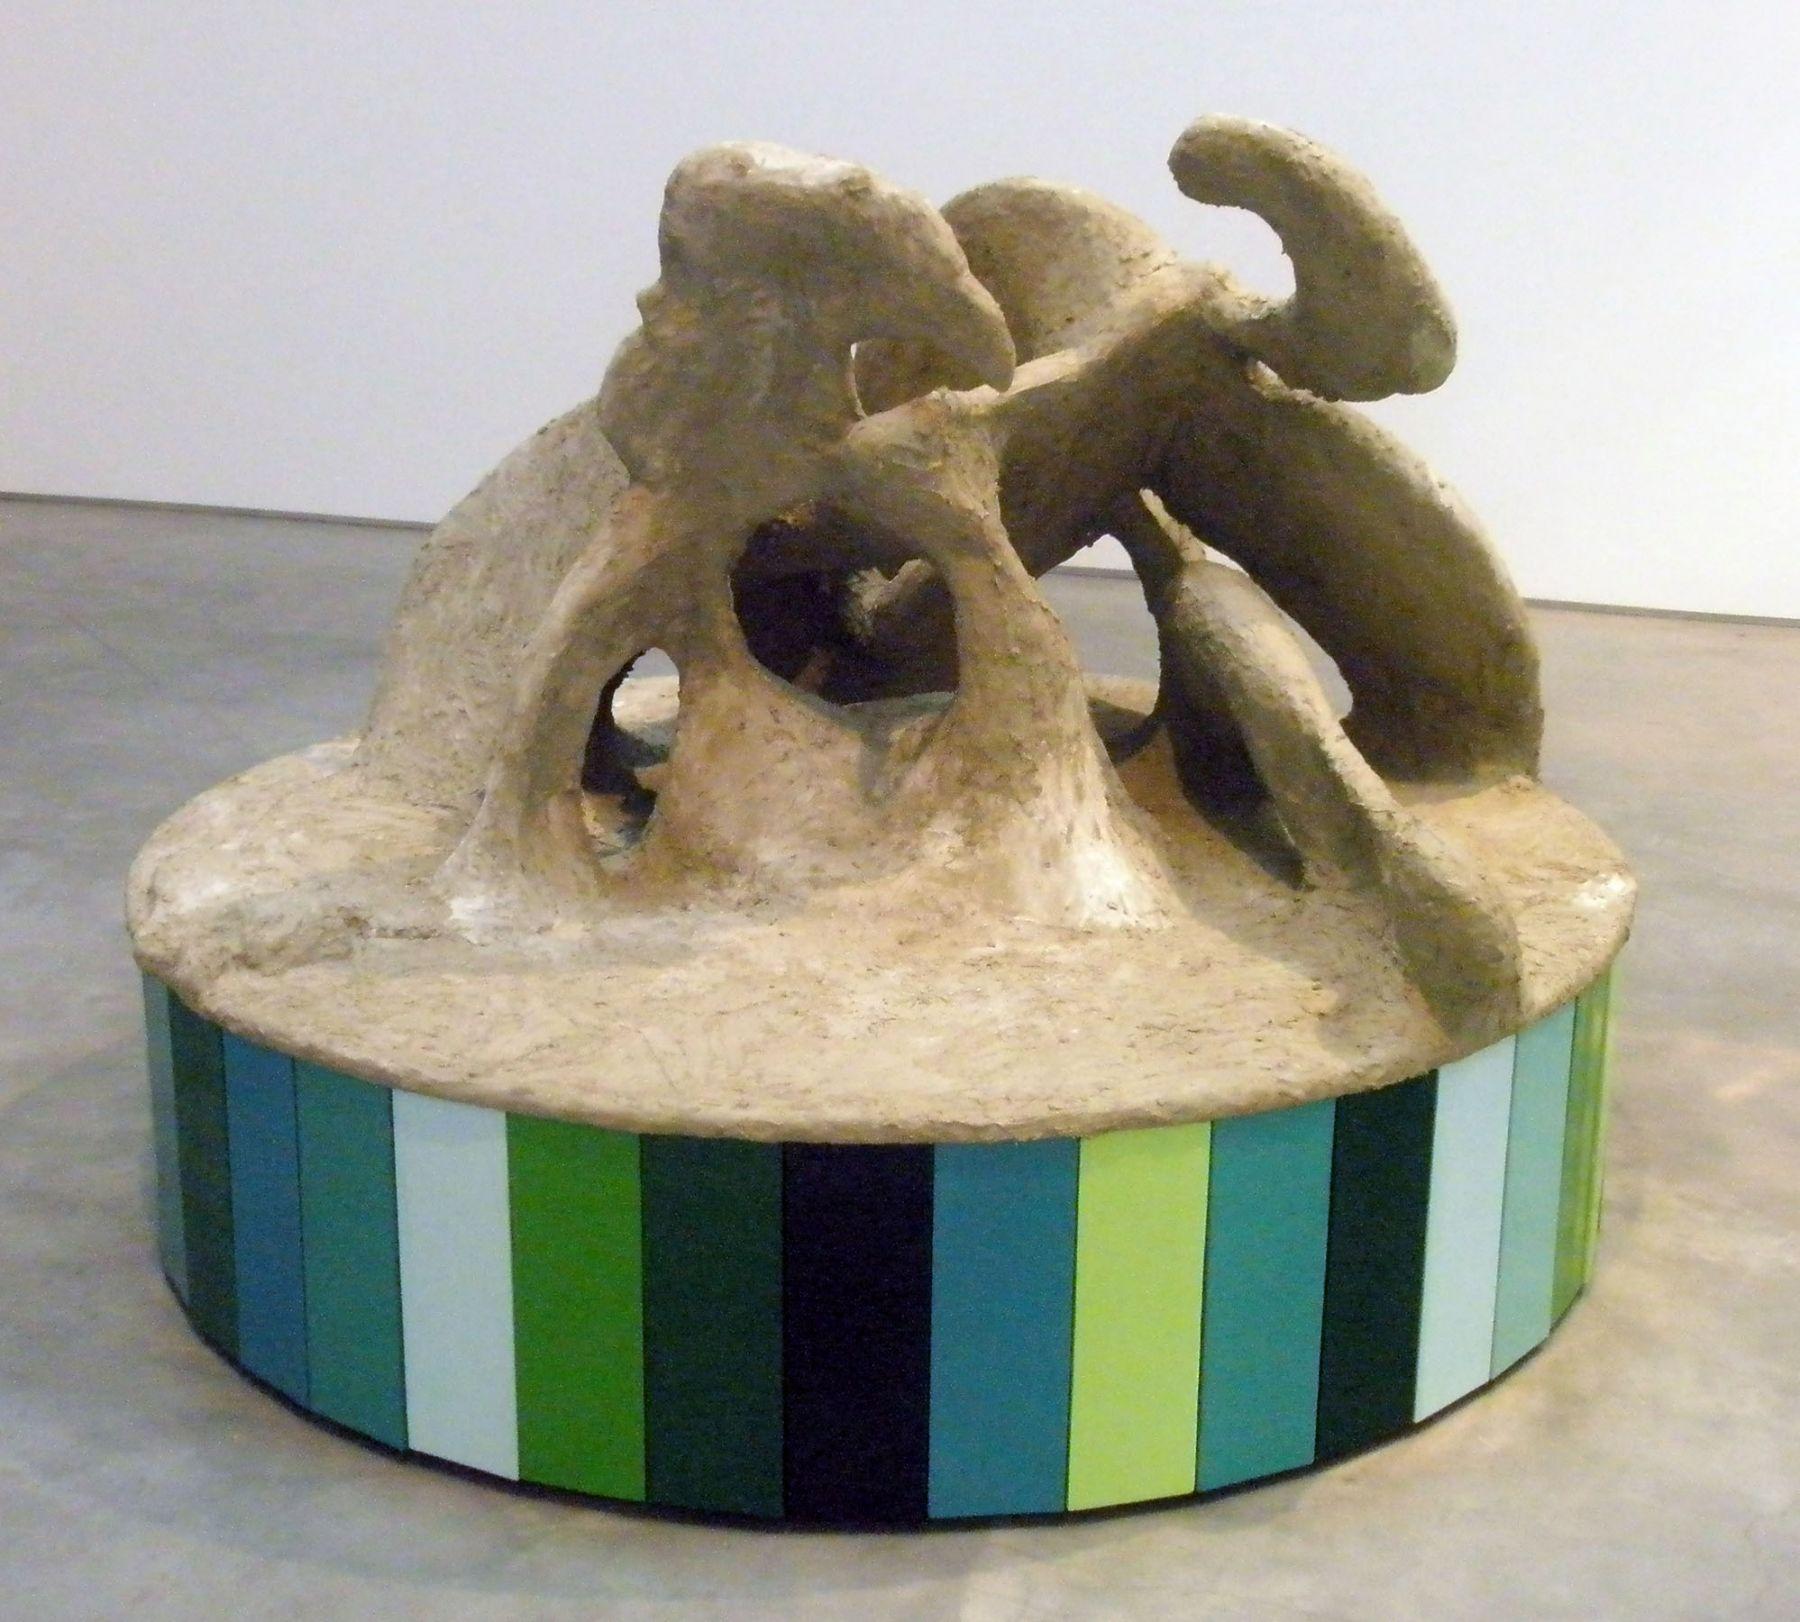 circular blue, green, and concrete sculpture by rachel feinstein